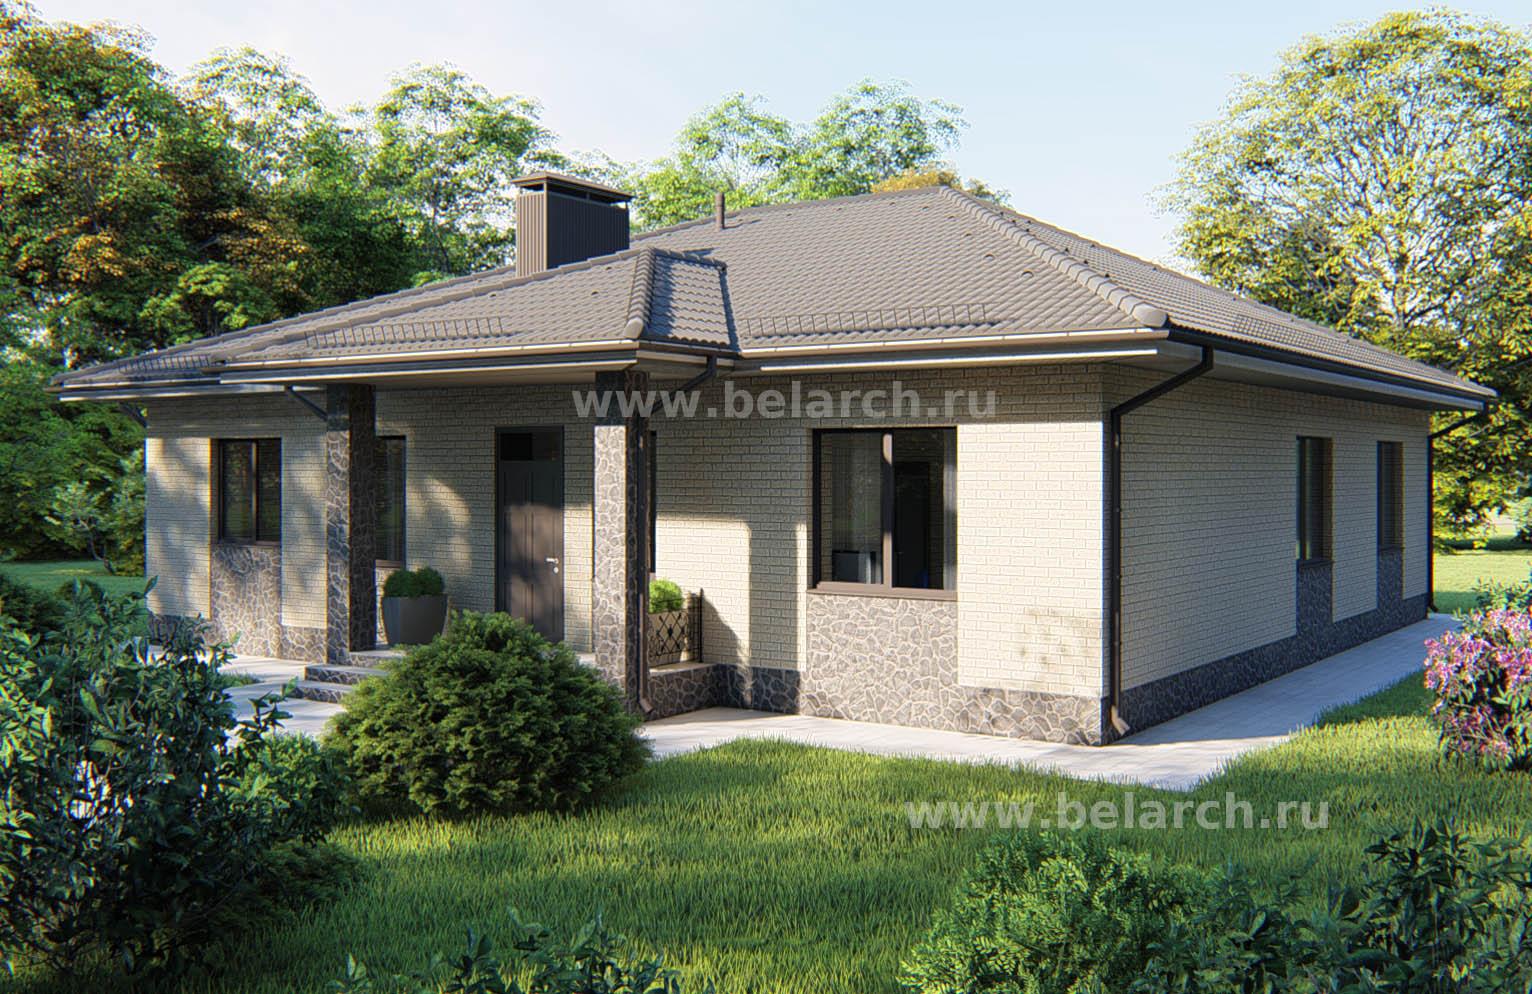 Проект одноэтажного дома 4 спальни - 160 кв.м.